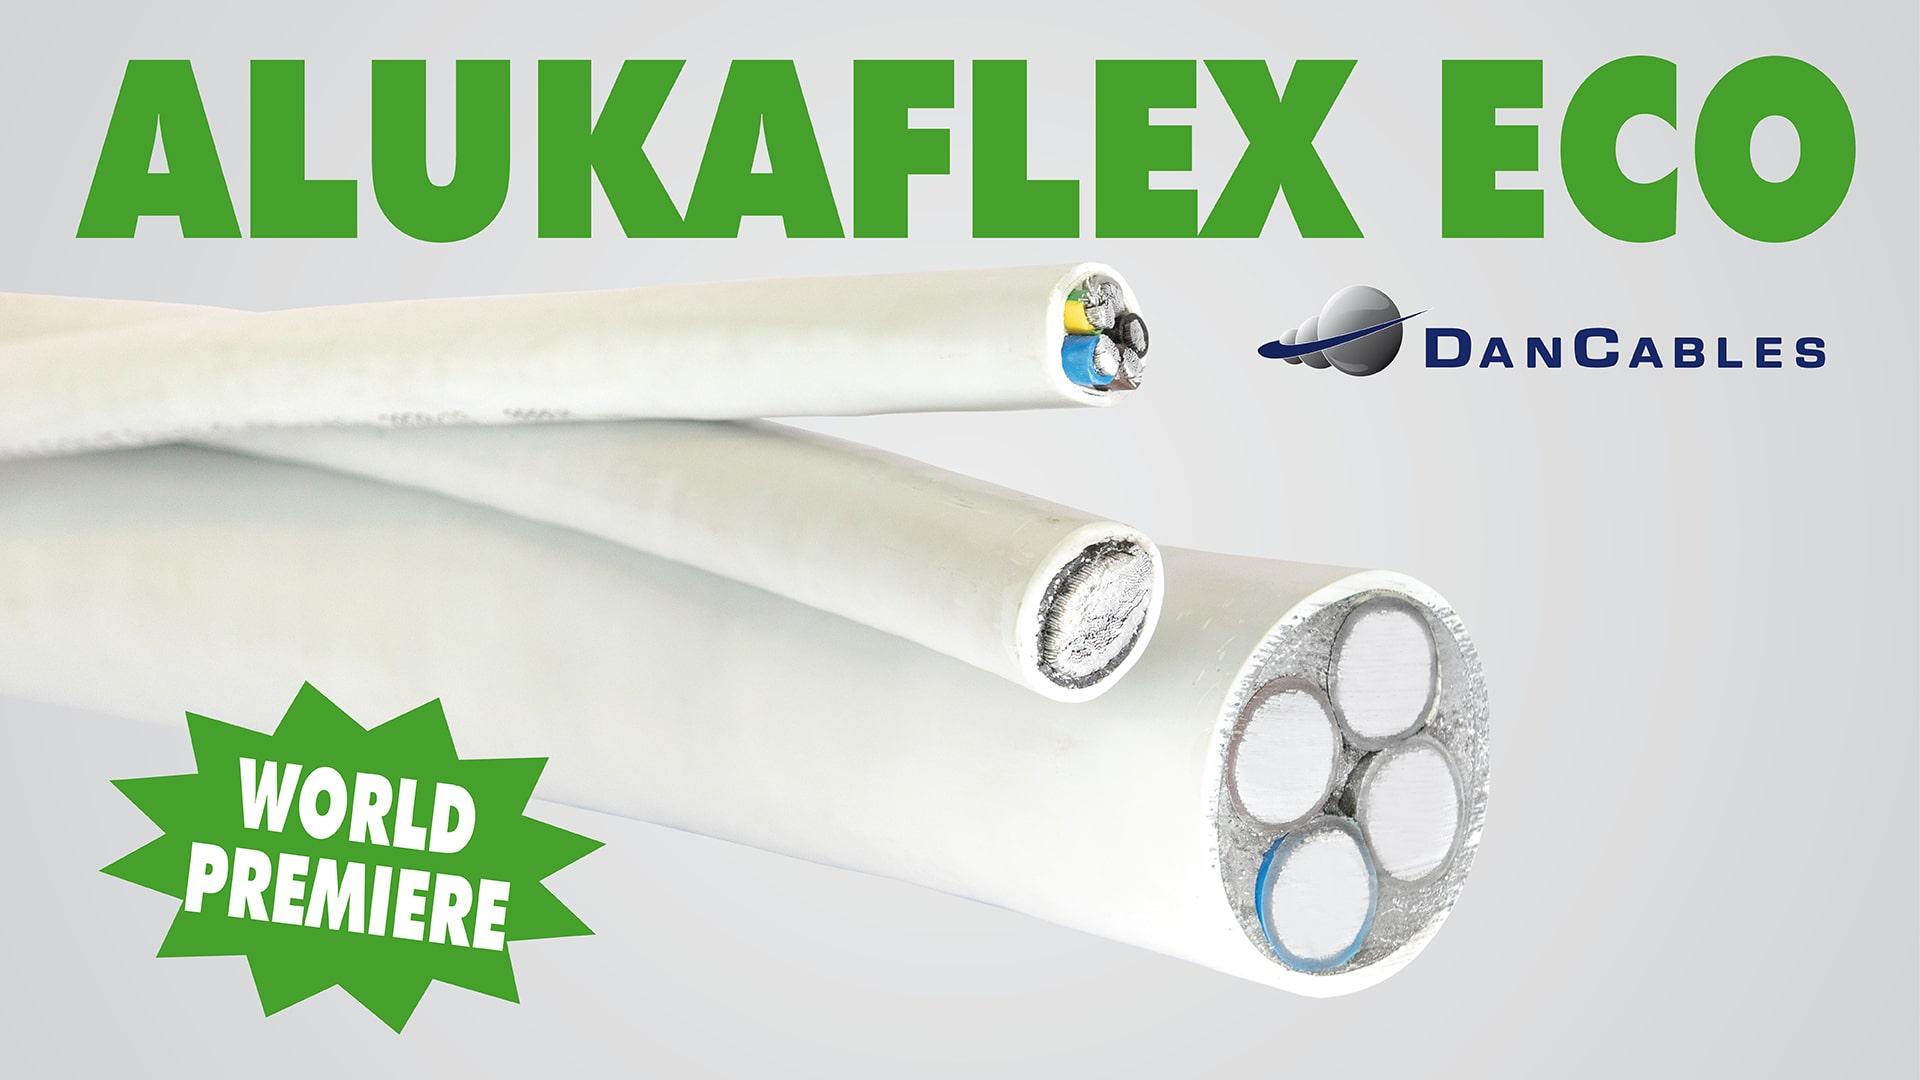 Alukaflex ECO installationskabel fra DanCables